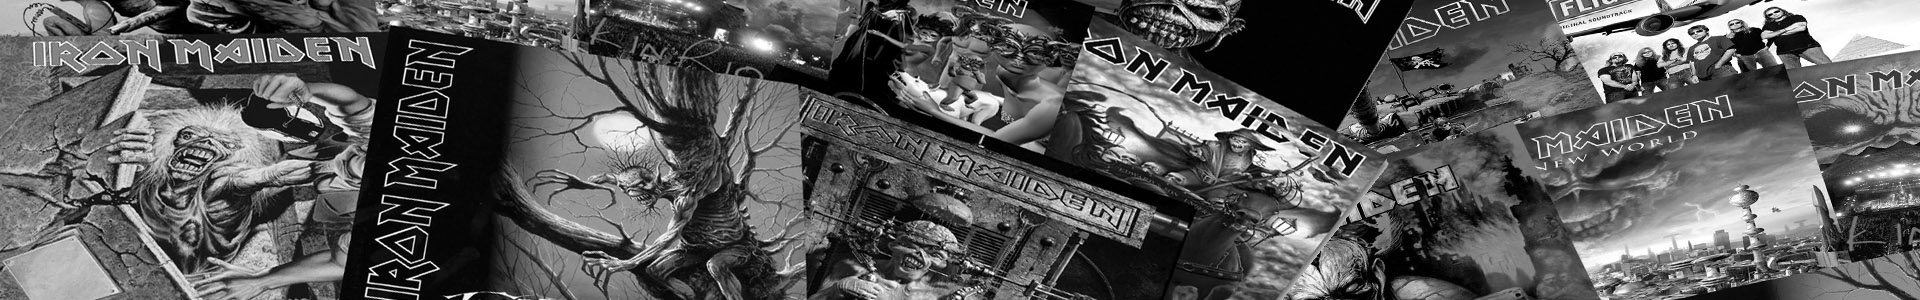 Iron Maiden announce next series of album vinyl reissues